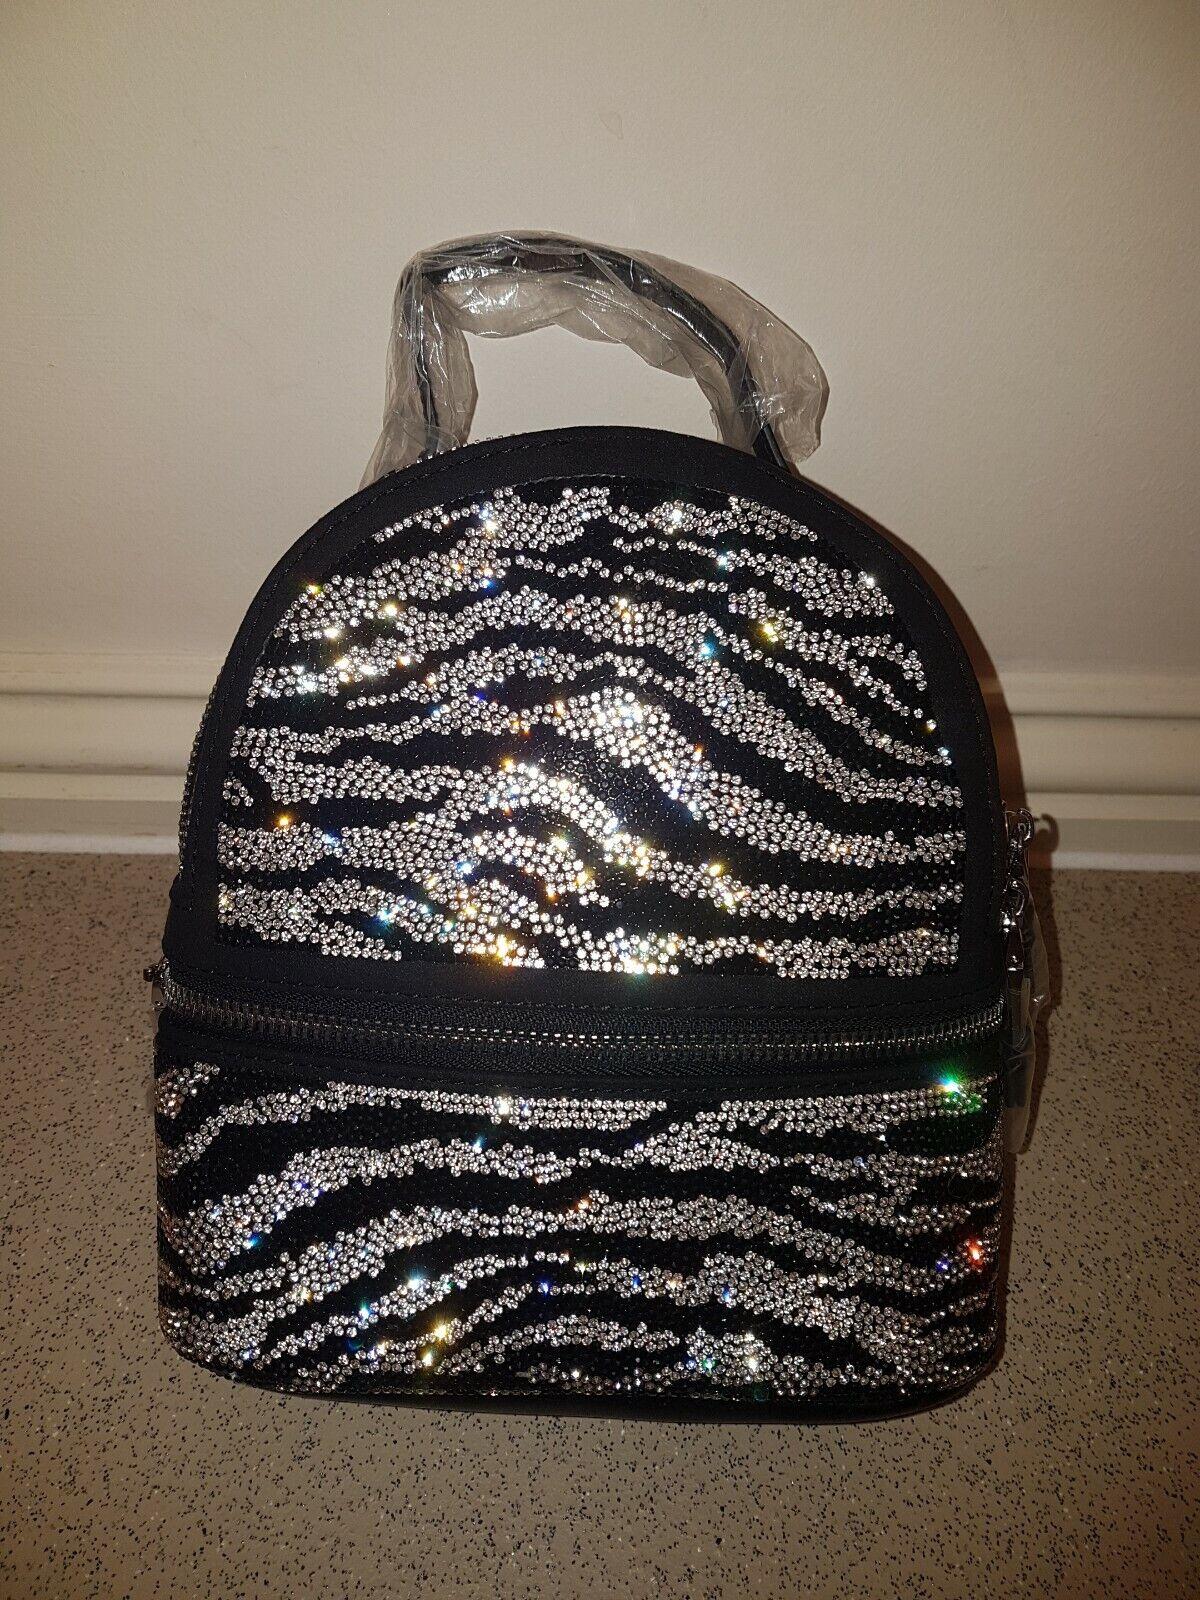 Steve Madden, Blioness, Jewelled Backpack in Zebra Print.